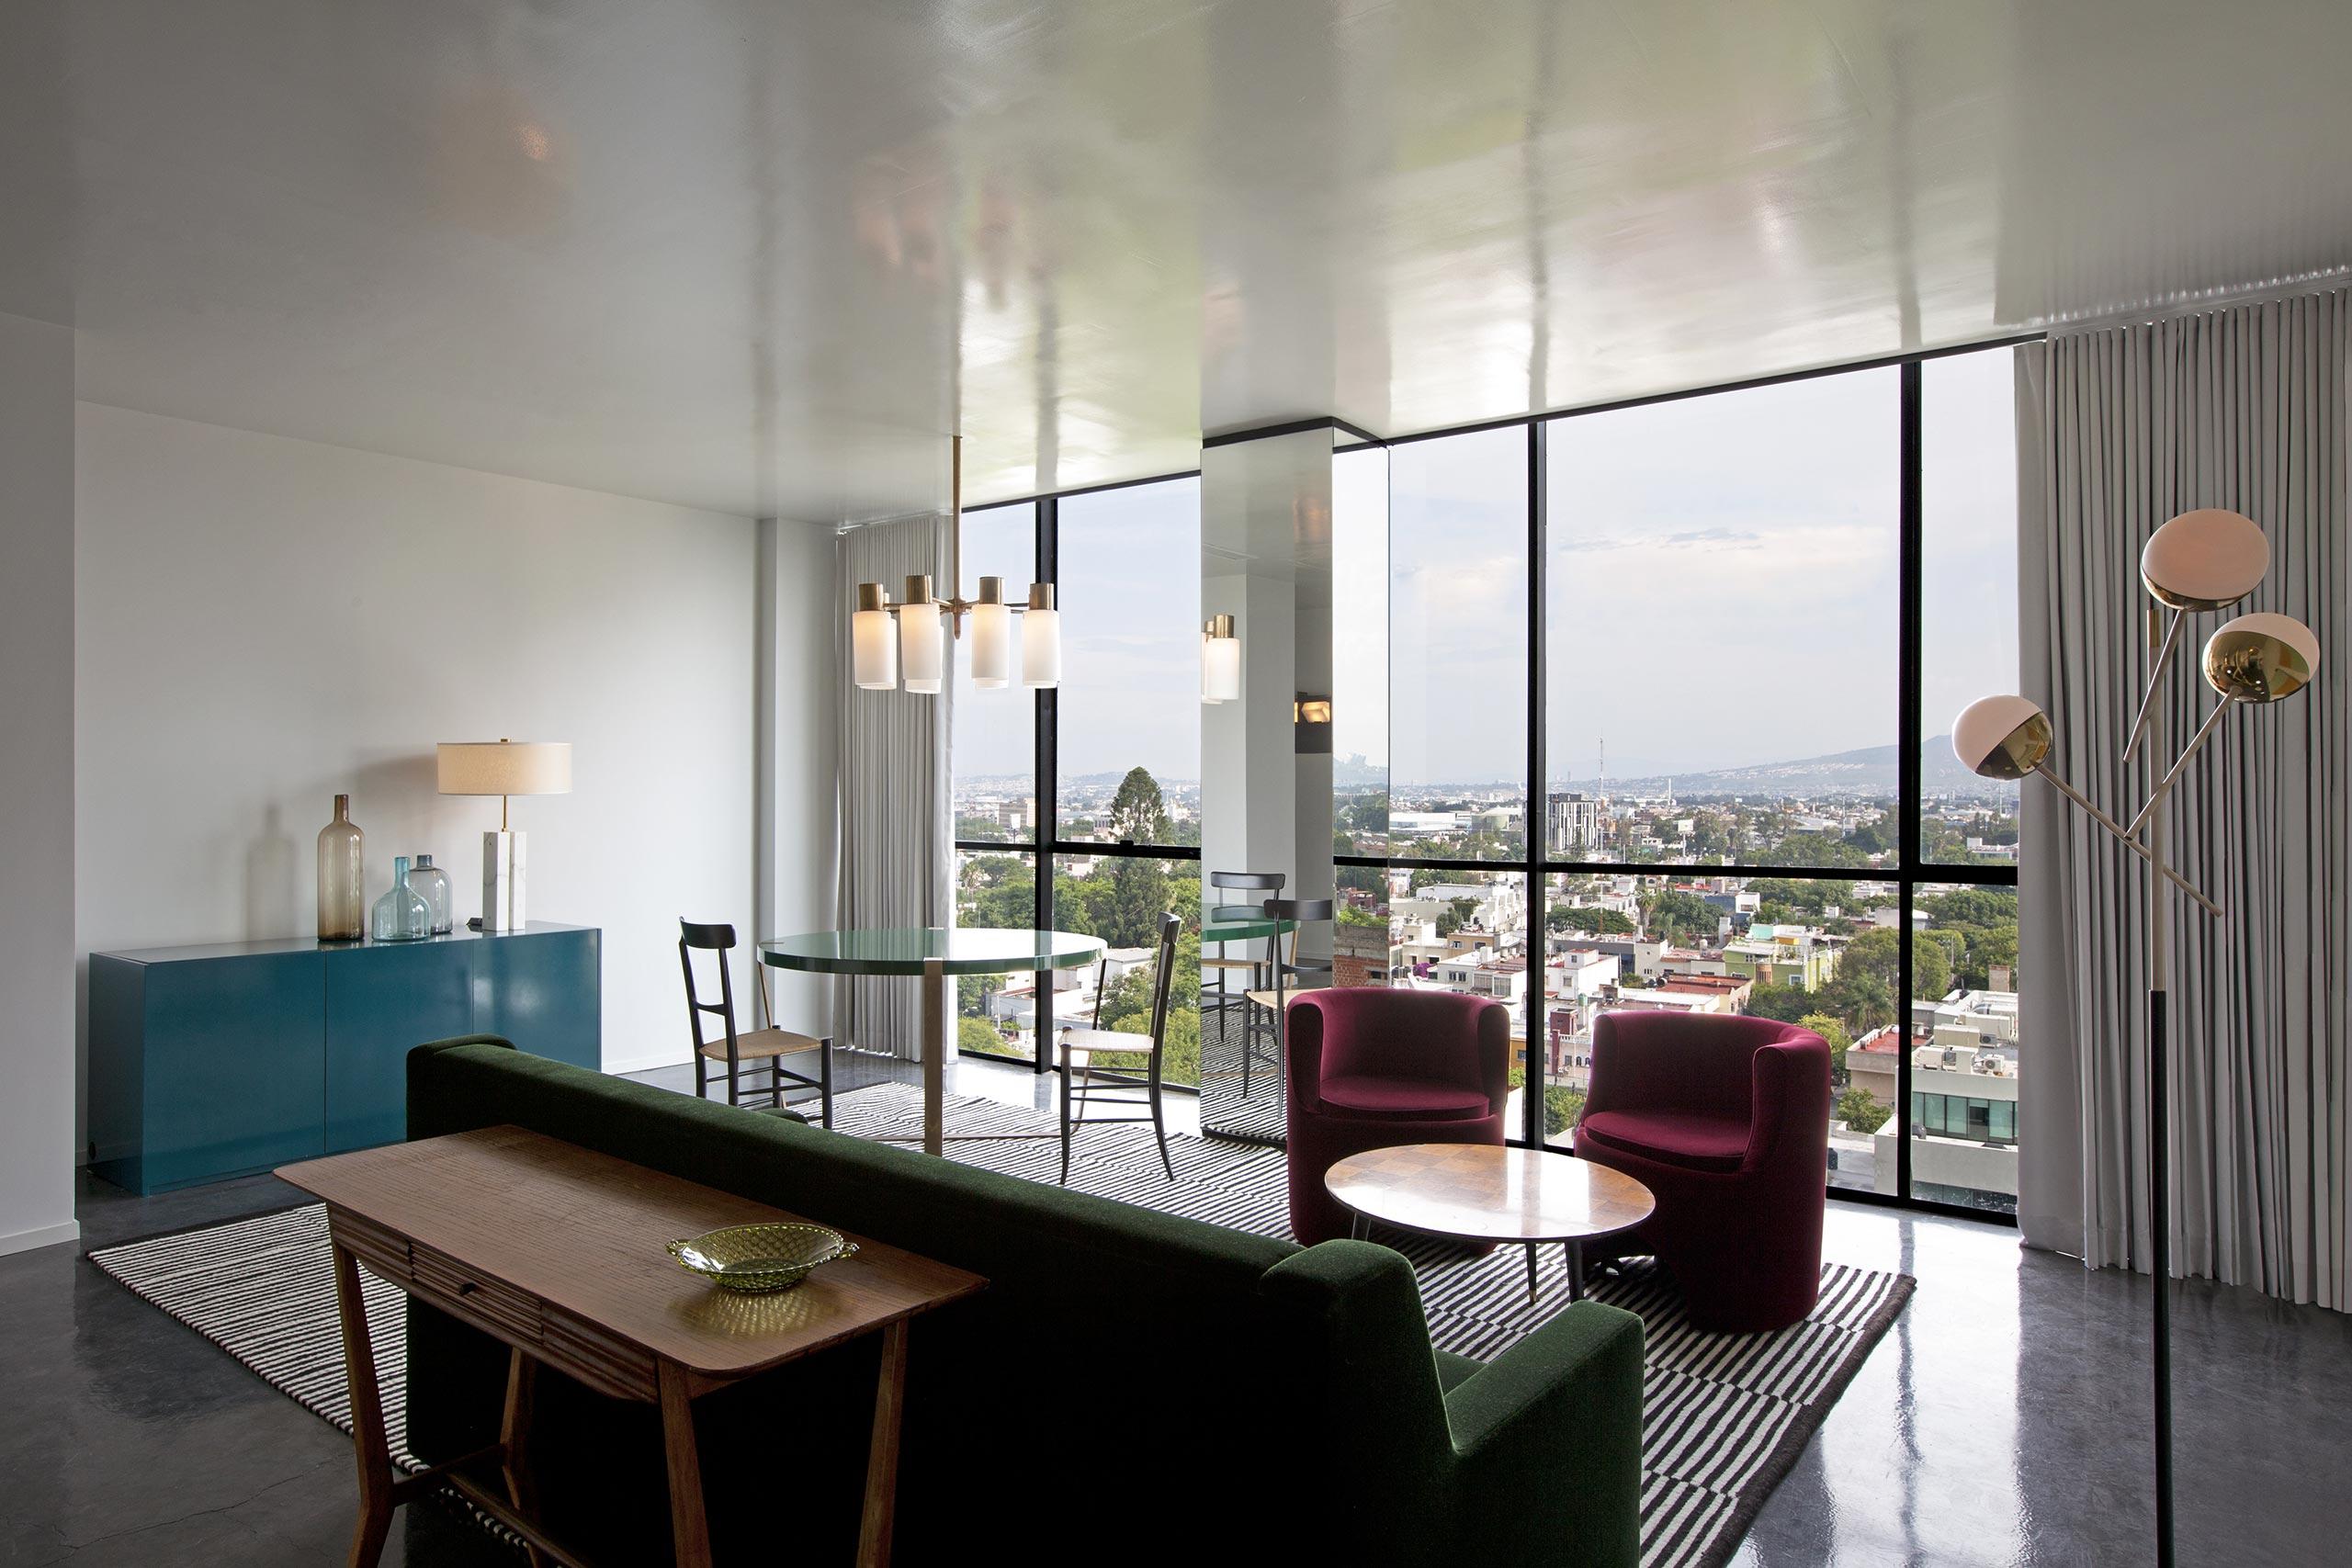 Casa Fayette by DIMORESTUDIO (Britt Moran & Emiliano Salci) in Guadalajara, Mexico. Member of Design Hotels™.